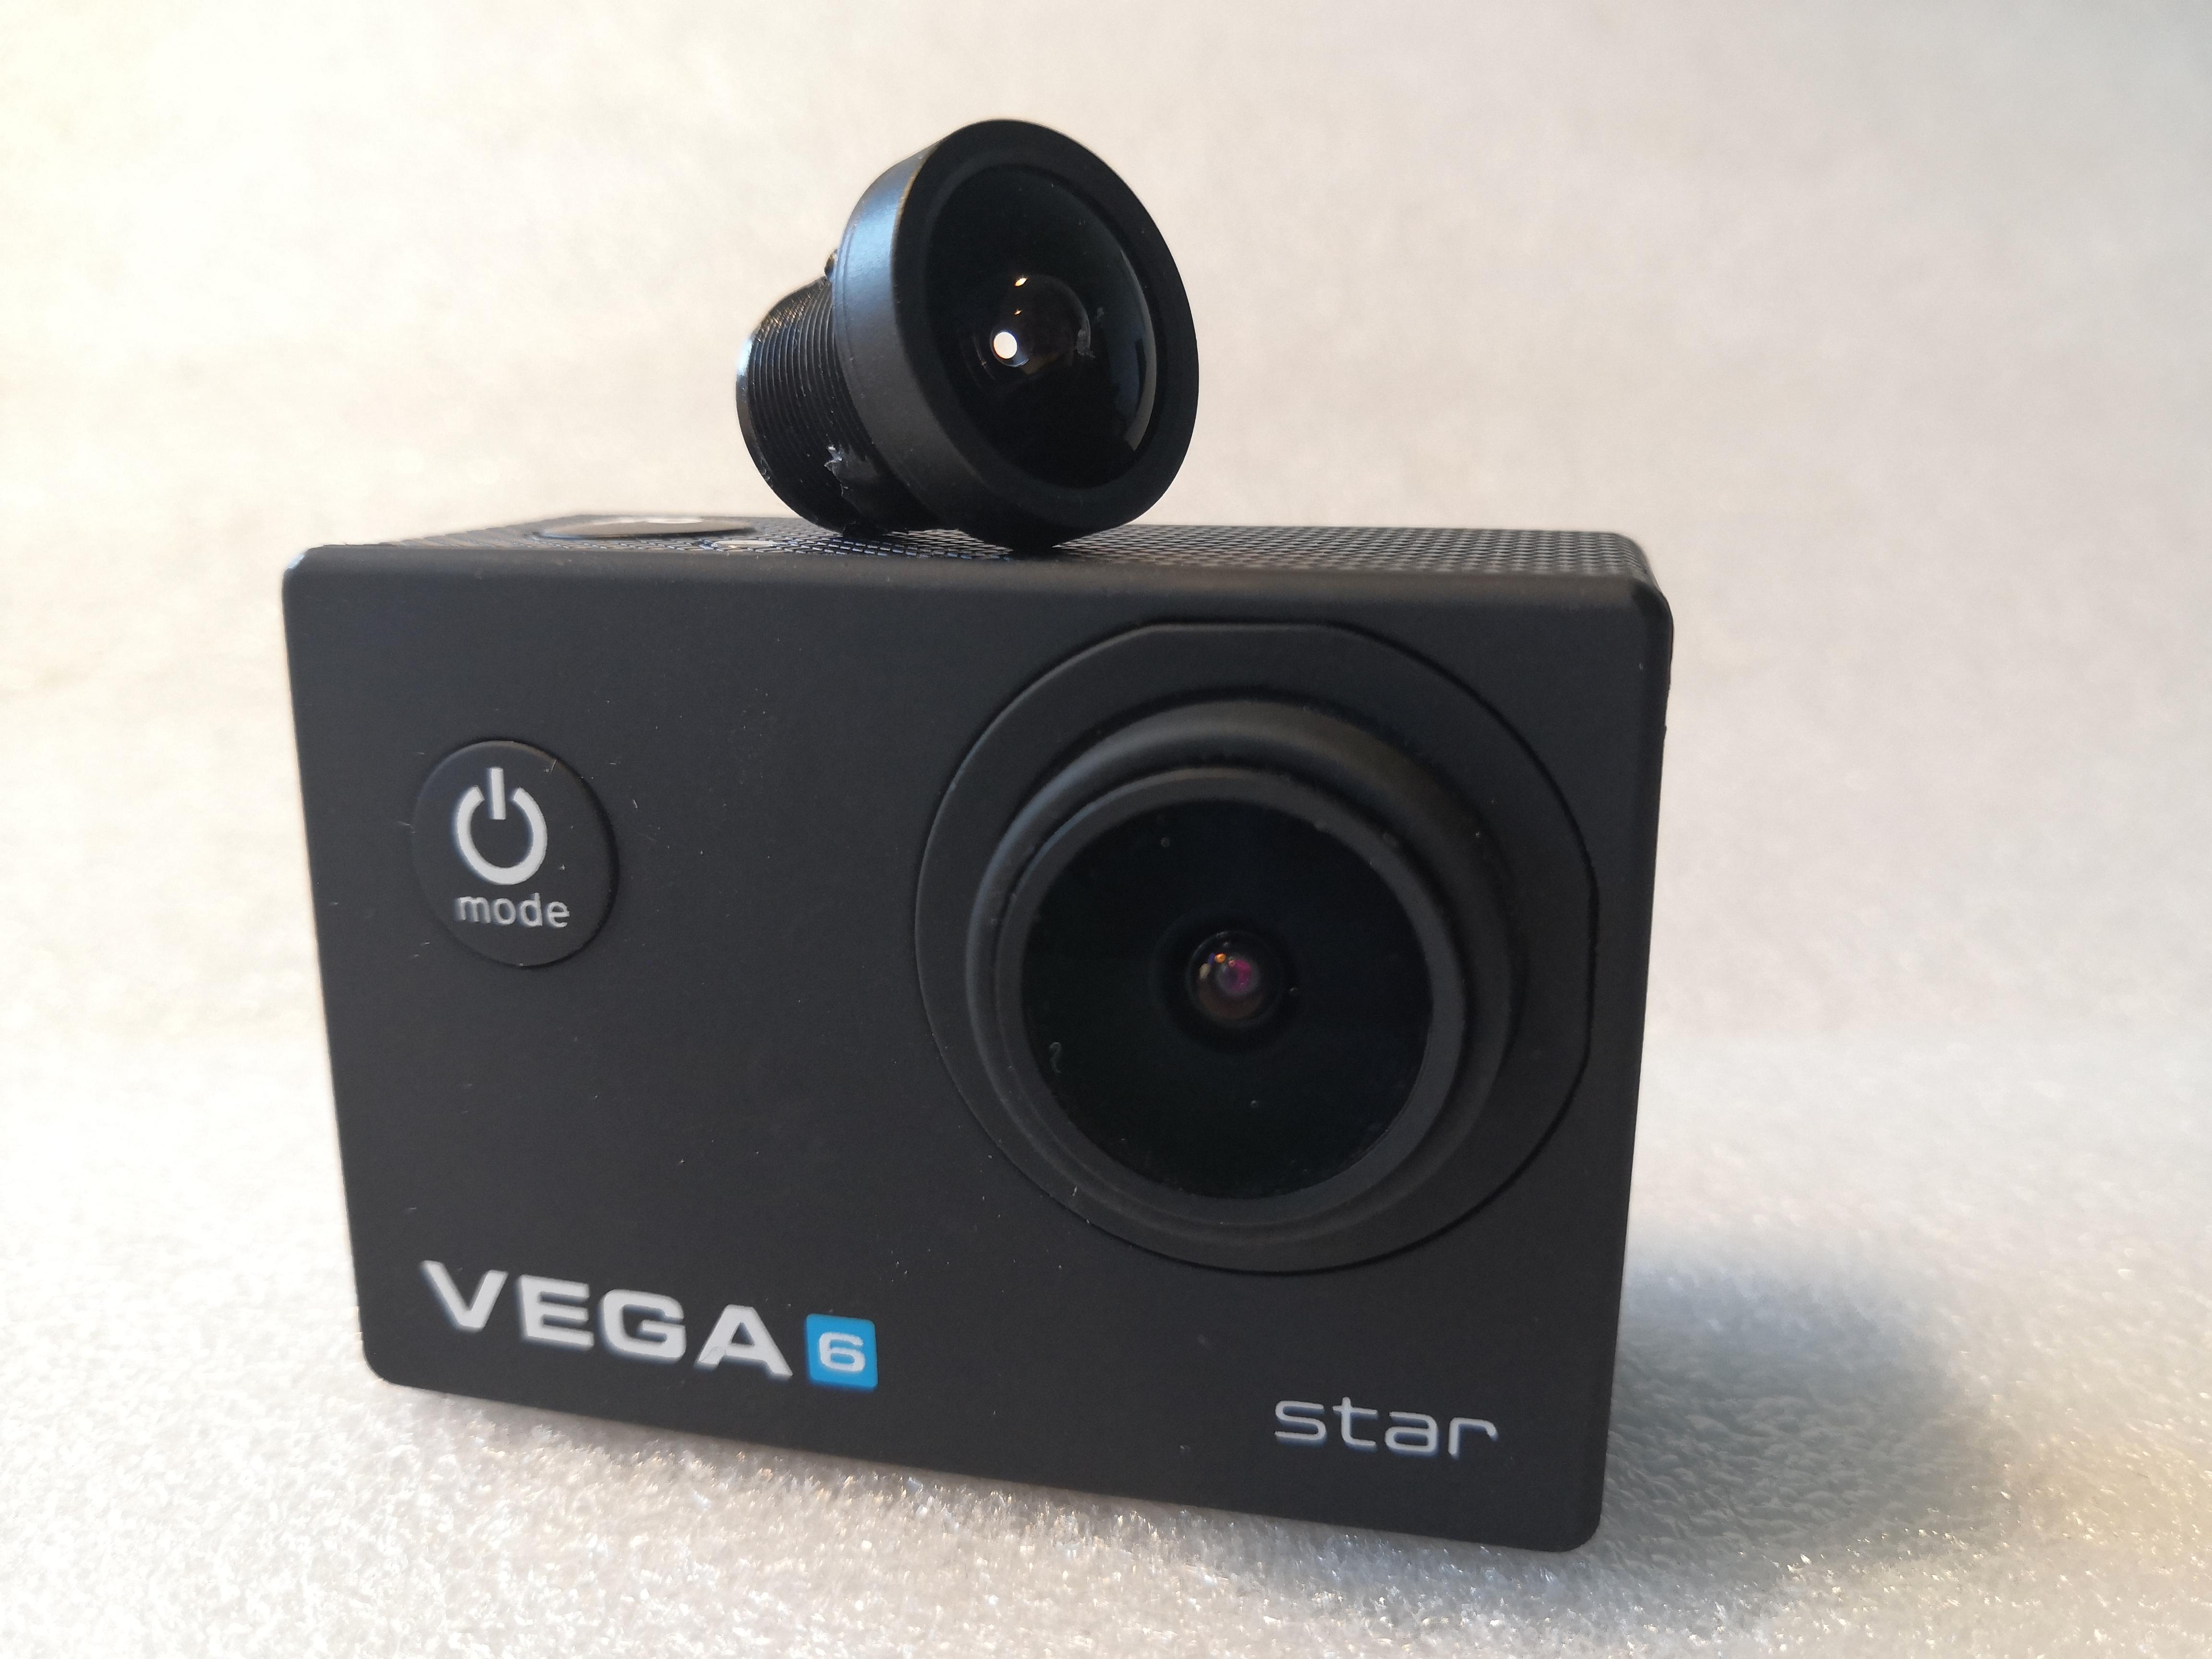 Poskrabana cocka kamera Niceboy Vega 6